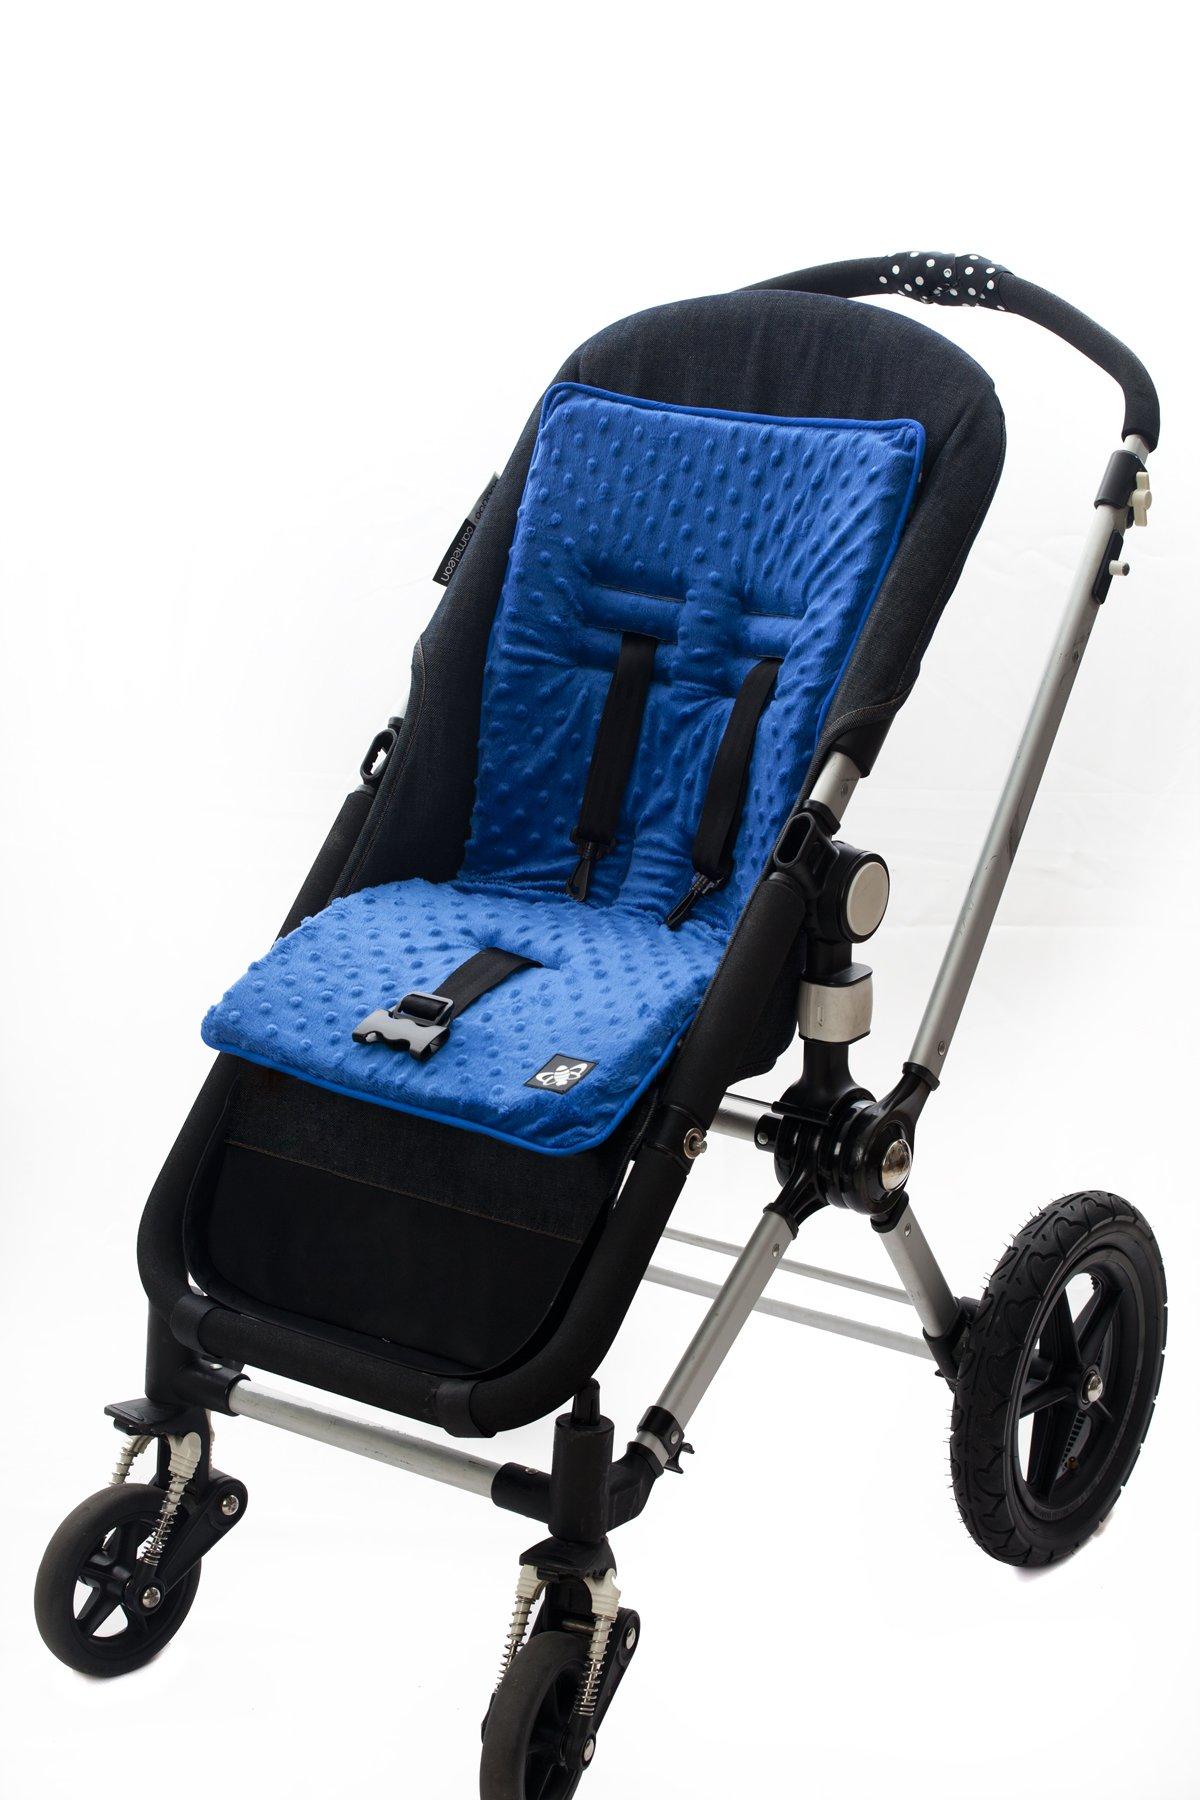 Baby-BeeHaven Cush n' Go Memory Foam Stroller Cushion Liner, Malibu Stripes